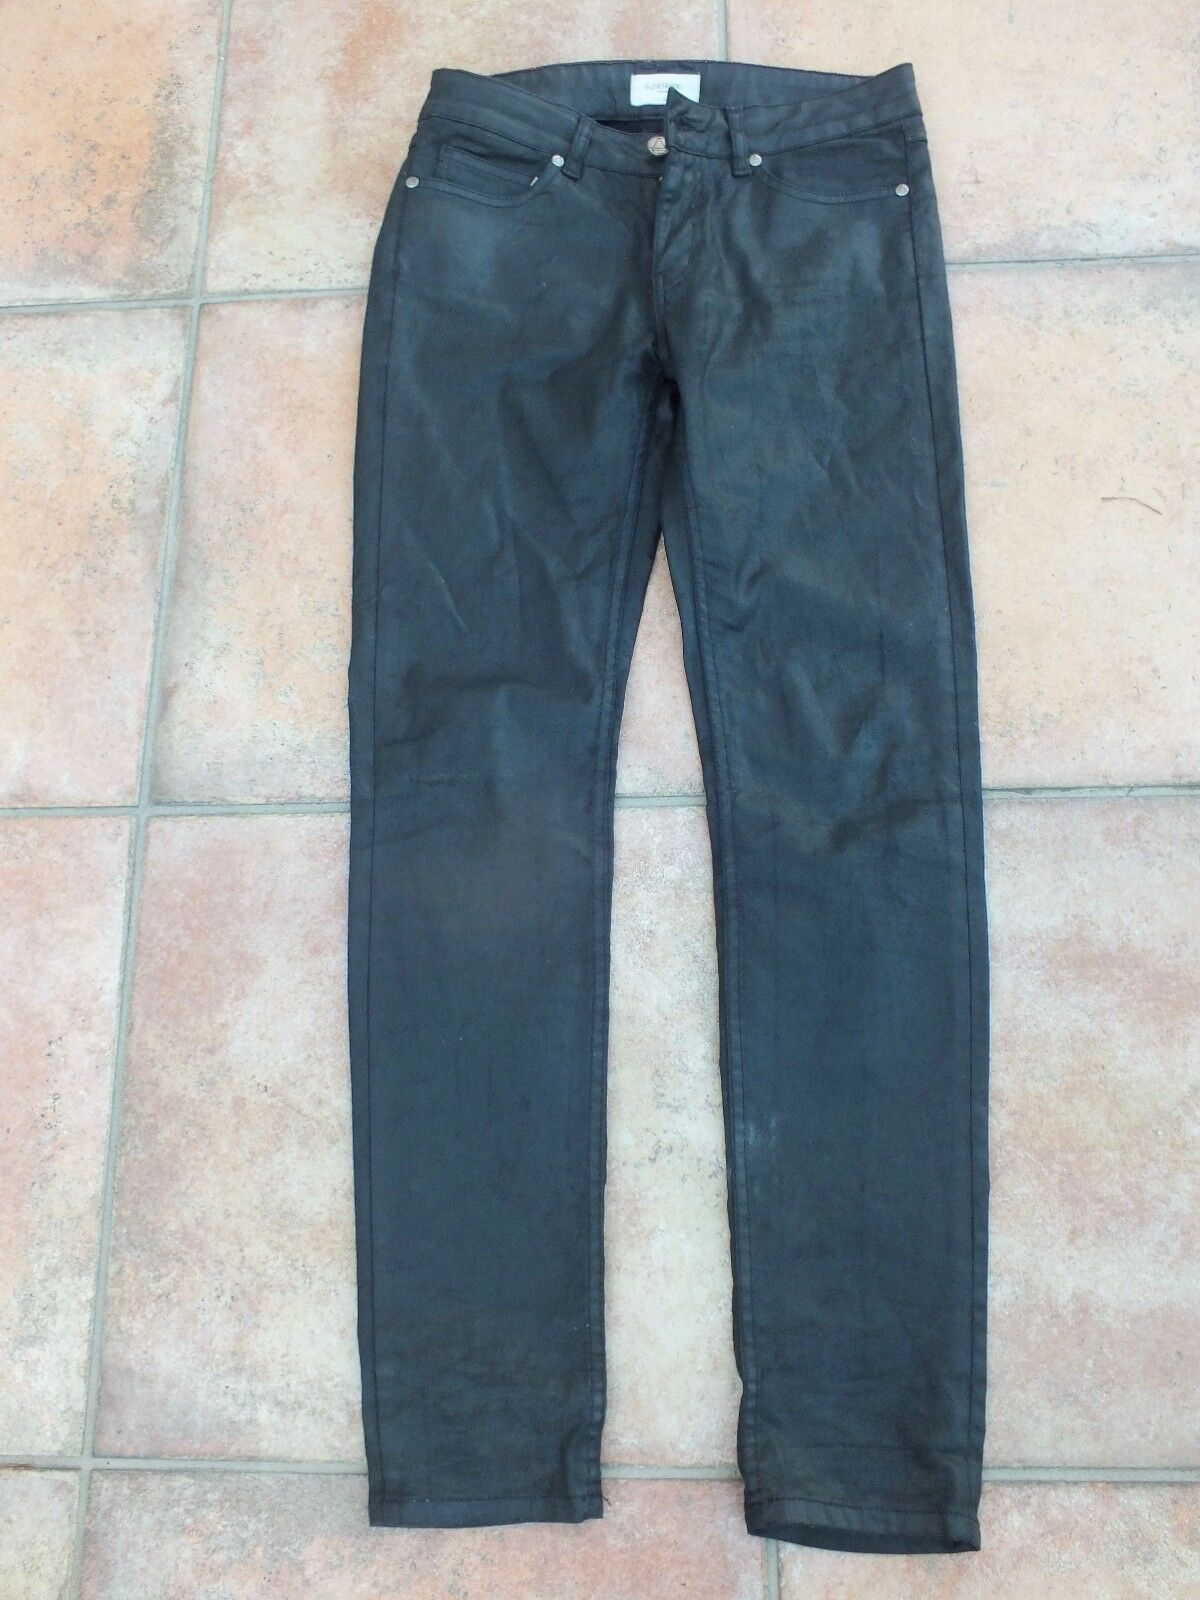 Pantaloni jeans di ELEVENPARIS coatet Cerati, W. Pelle, Tg. 28 NUOVO